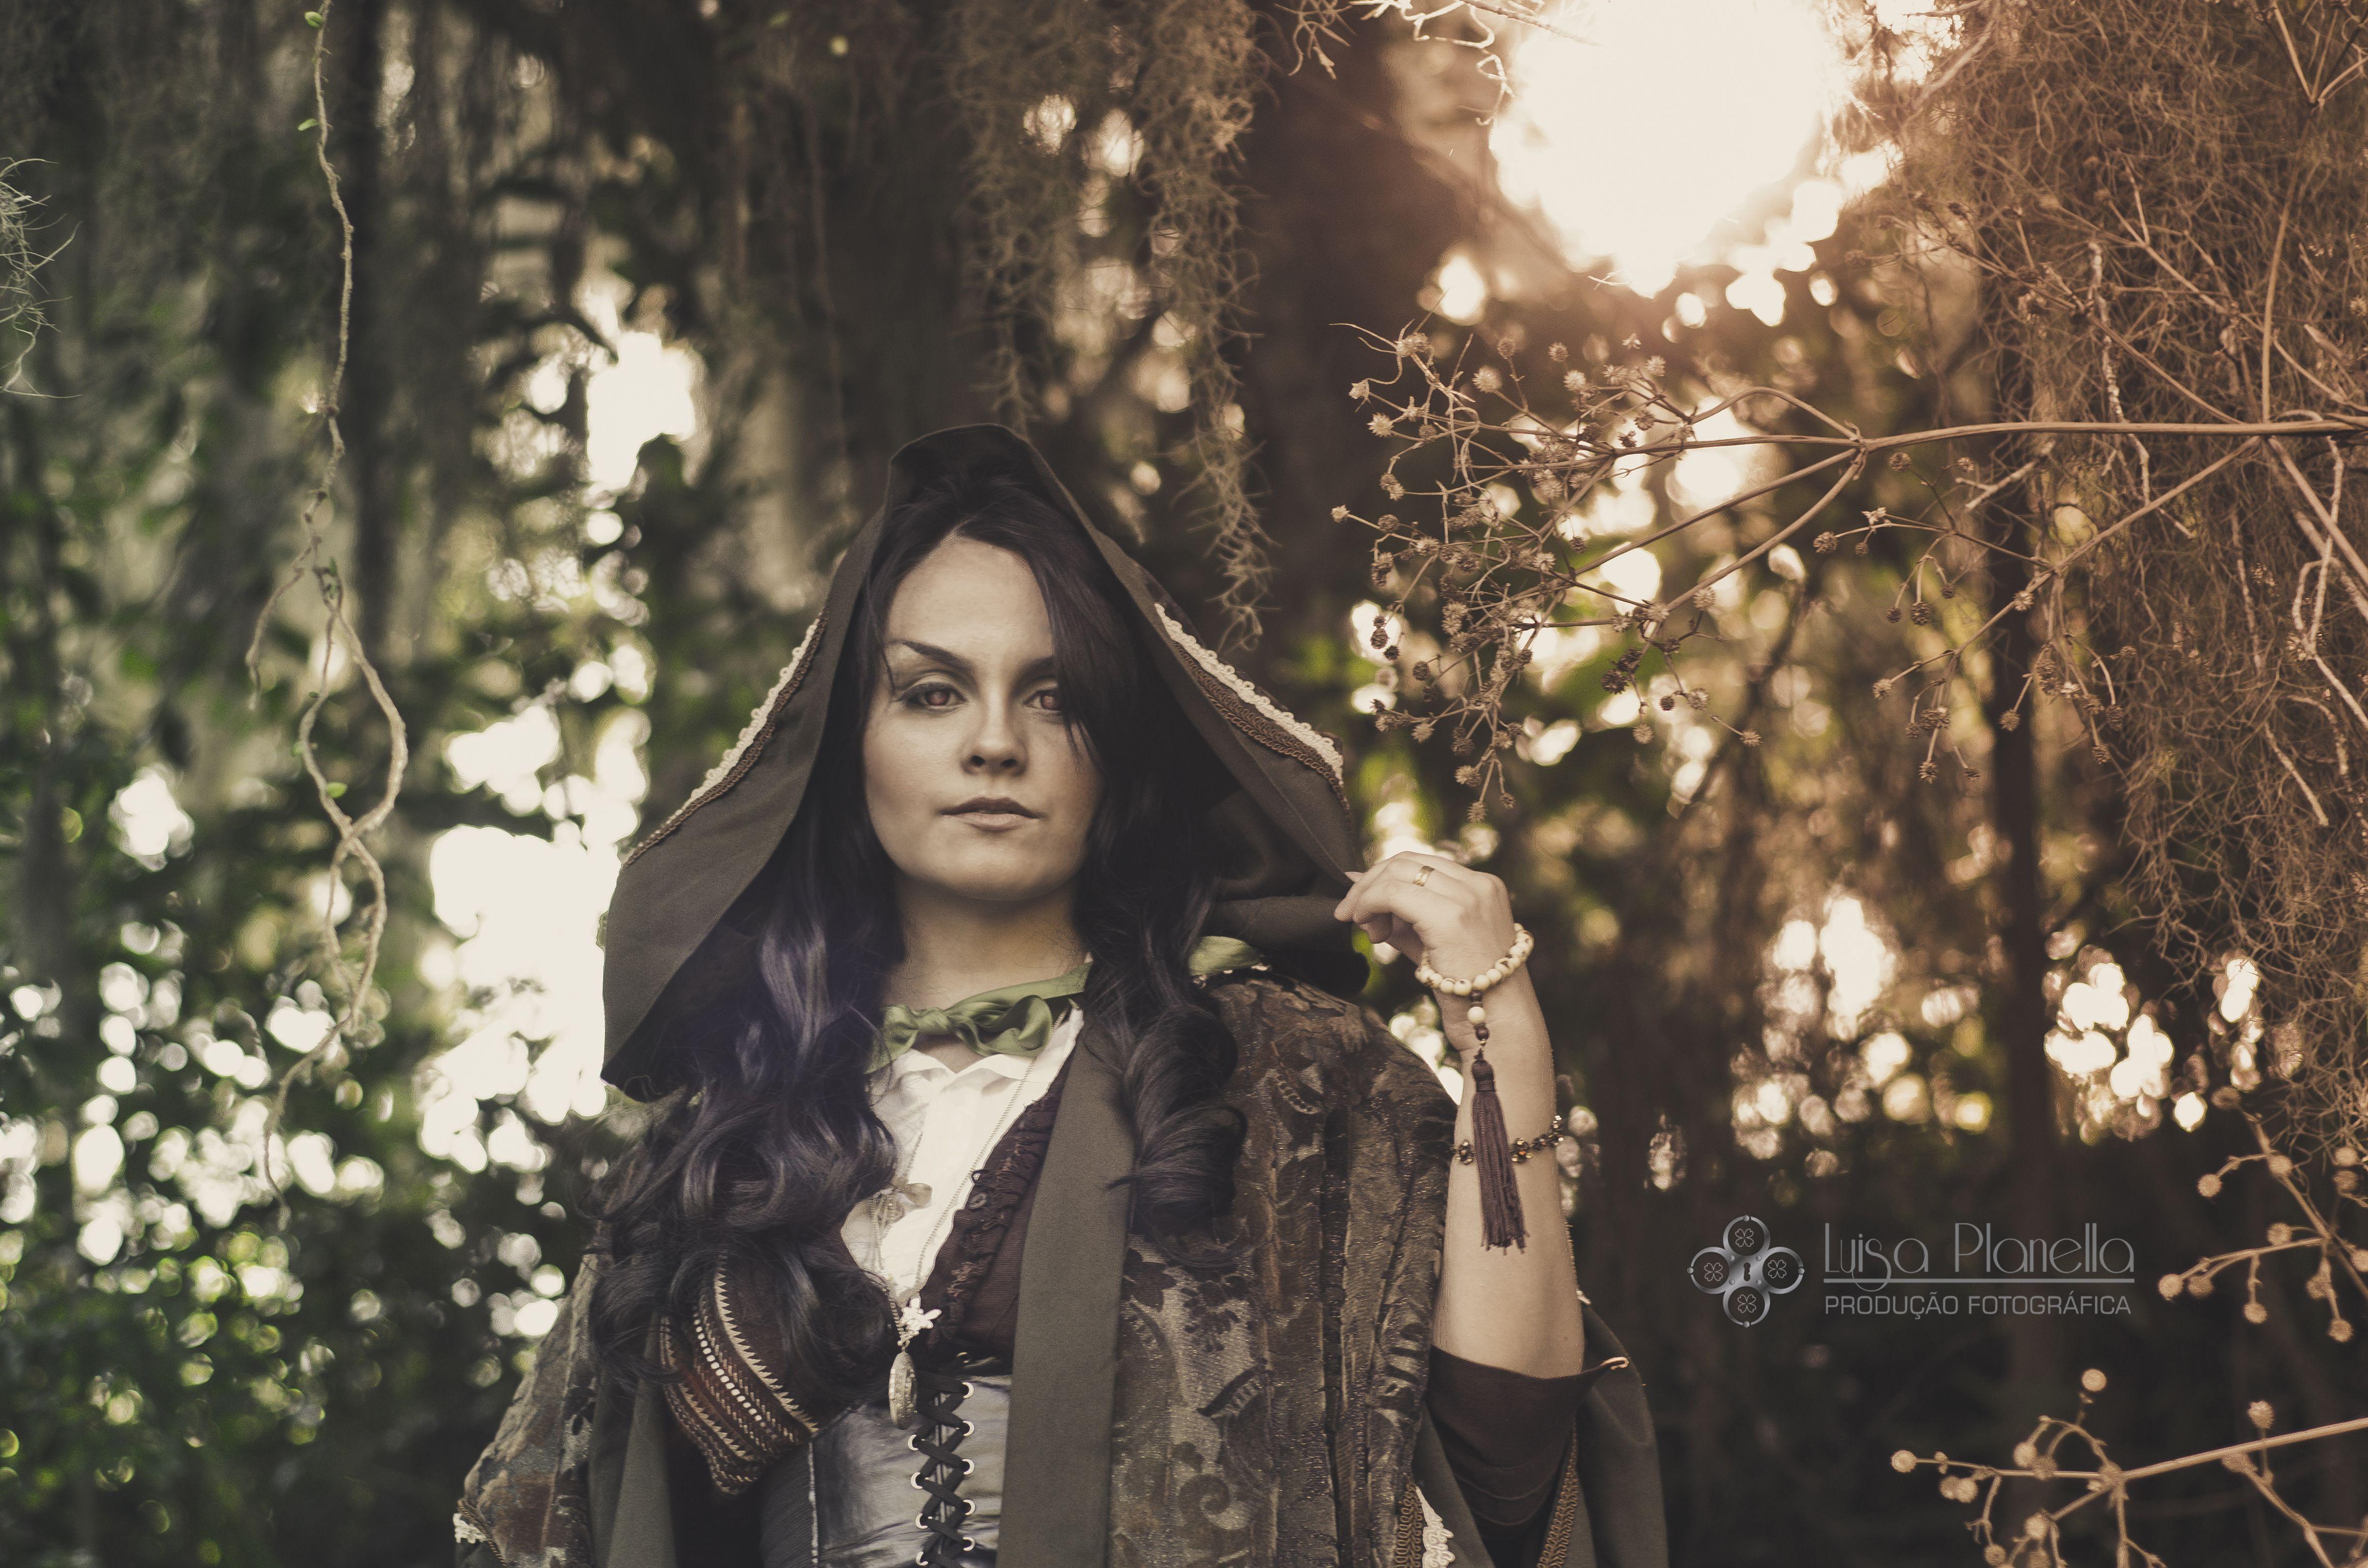 Ensaio Temático Fotografia: Luísa Planella Figurinos e acessórios: Bellas Fantasias e Izzy BD Modelo: Ivy Wylde